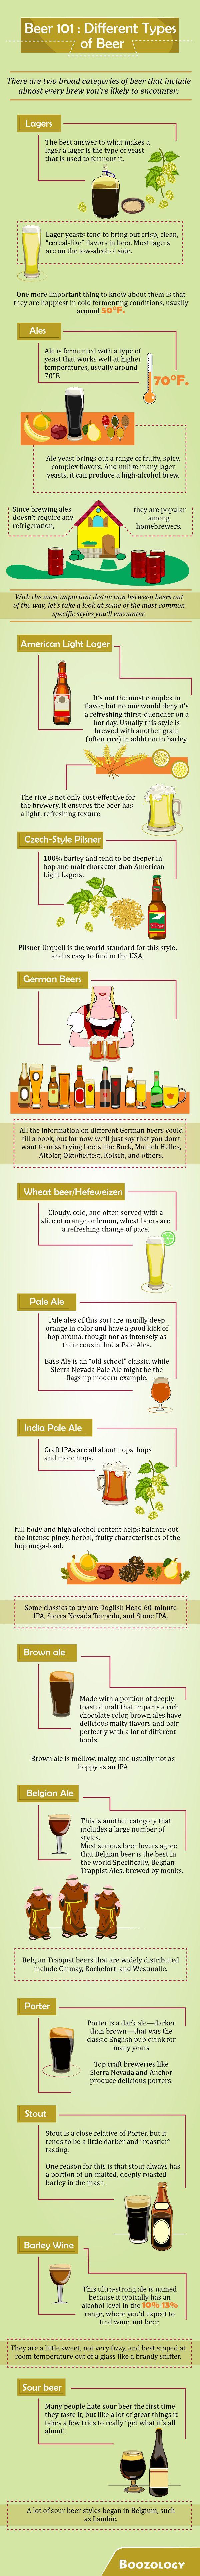 Different Types Of Beer (Beer 101)